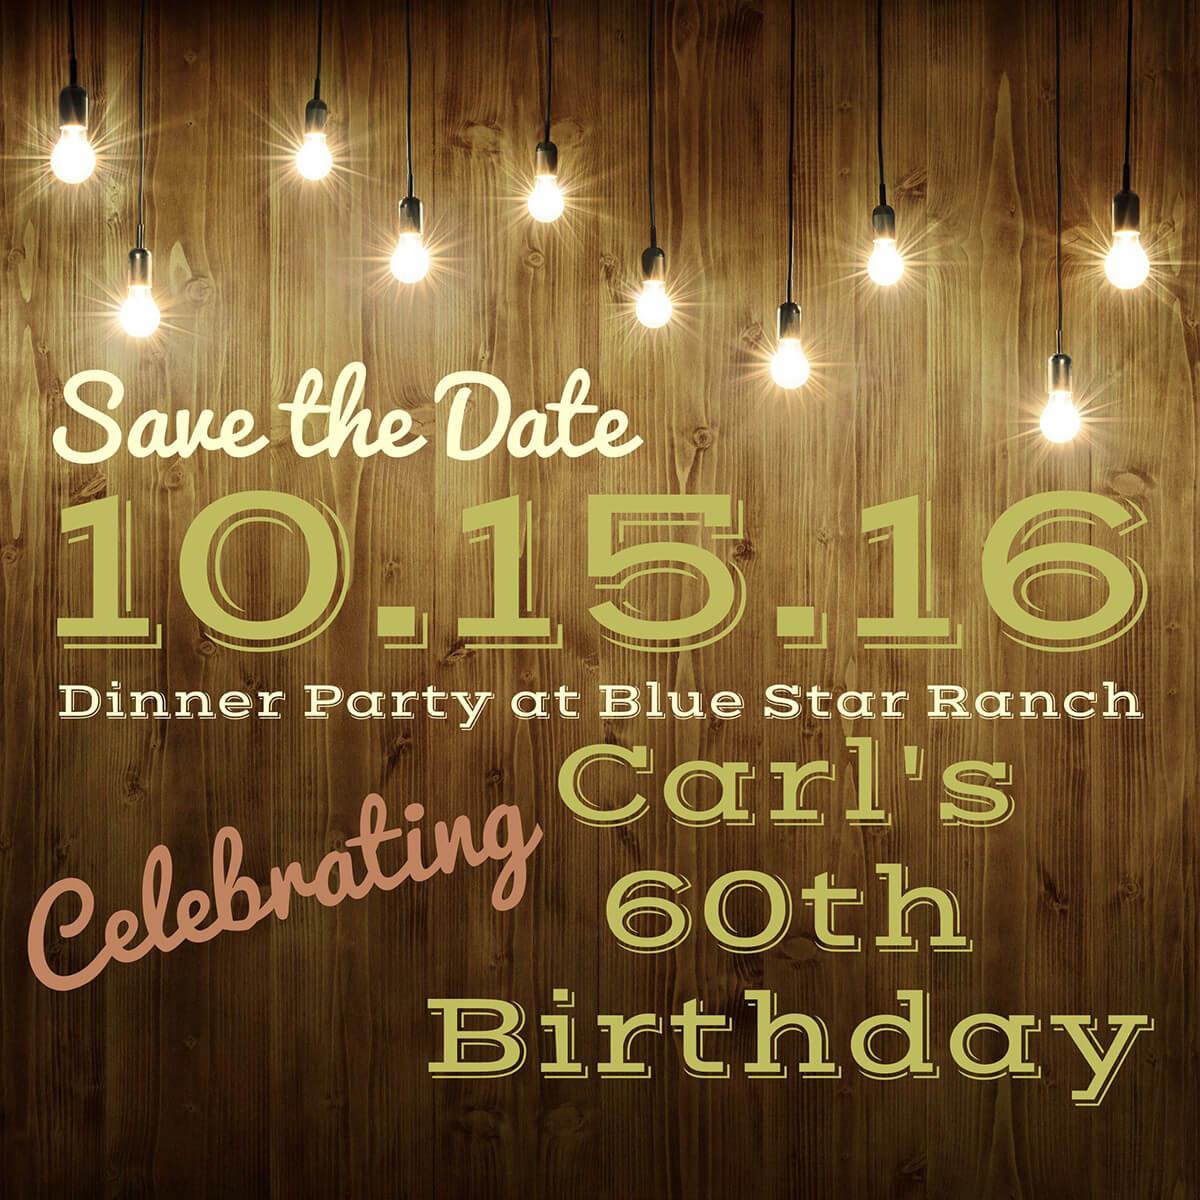 Invitation Maker: Create Invitations For Free   Adobe Spark - Free Printable Save The Date Birthday Invitations